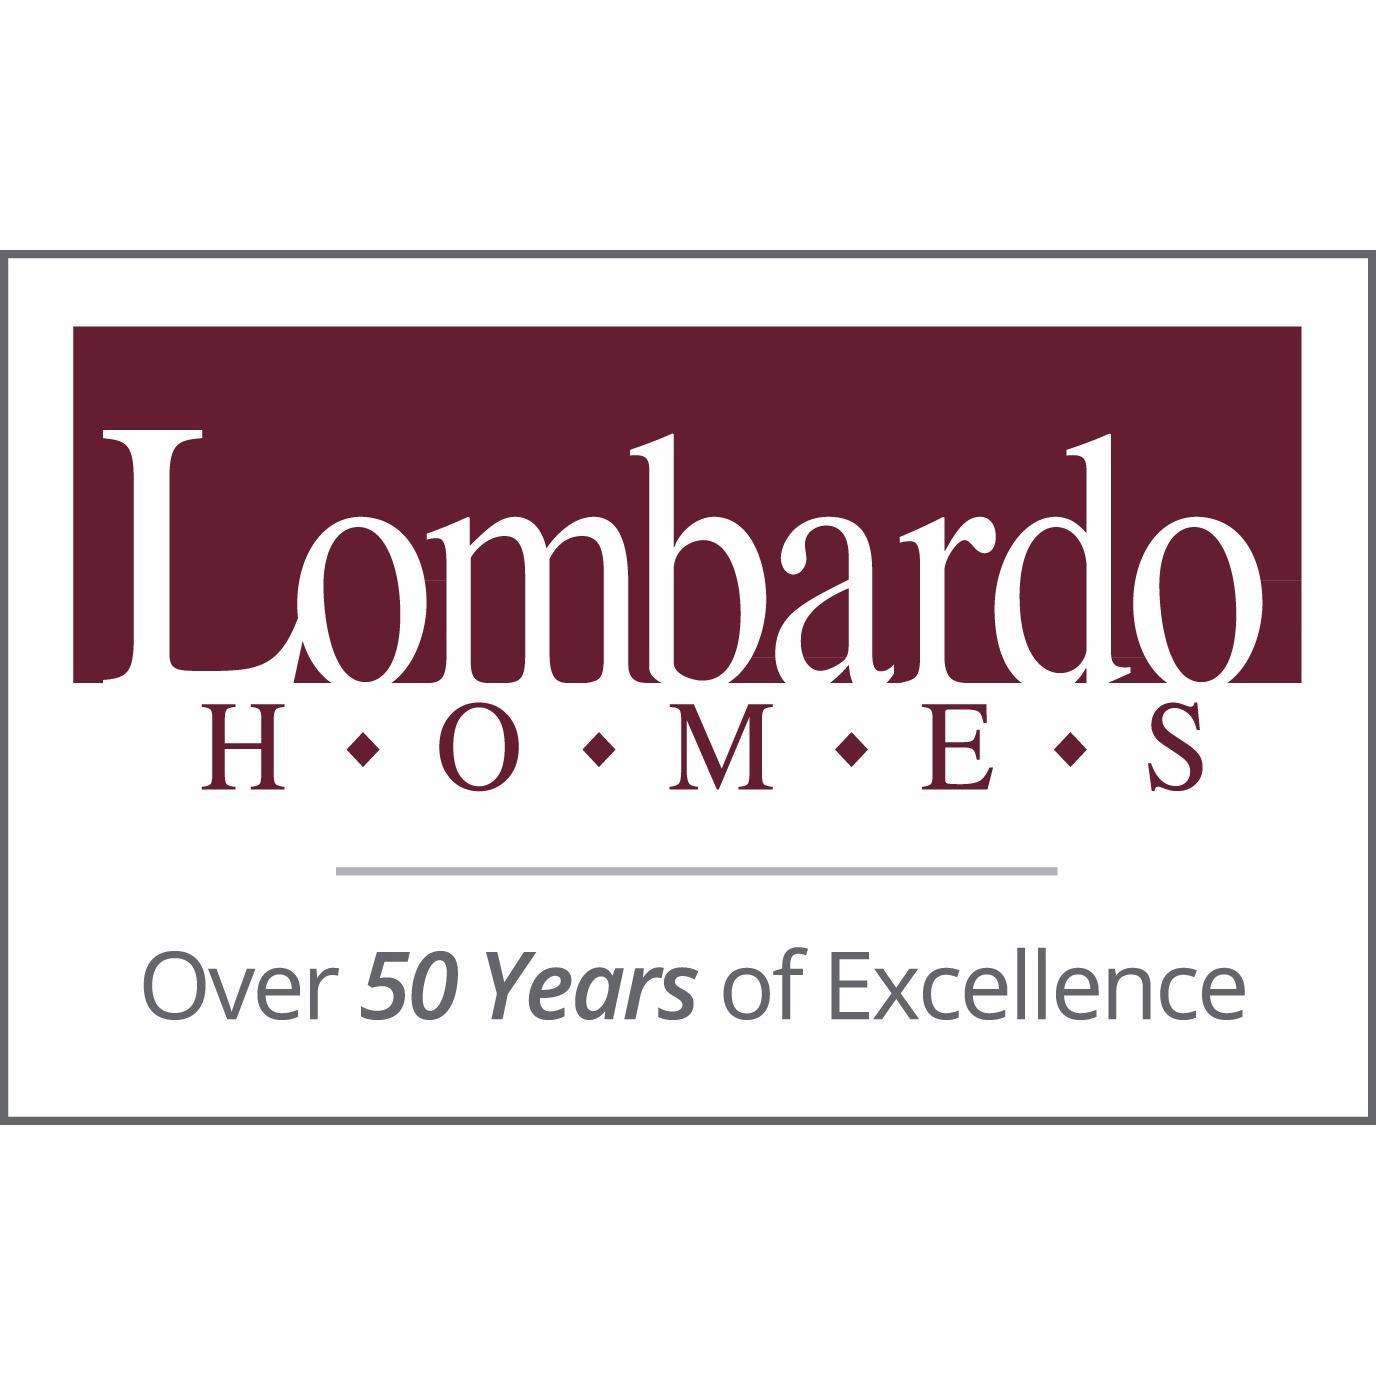 Lombardo Homes image 3